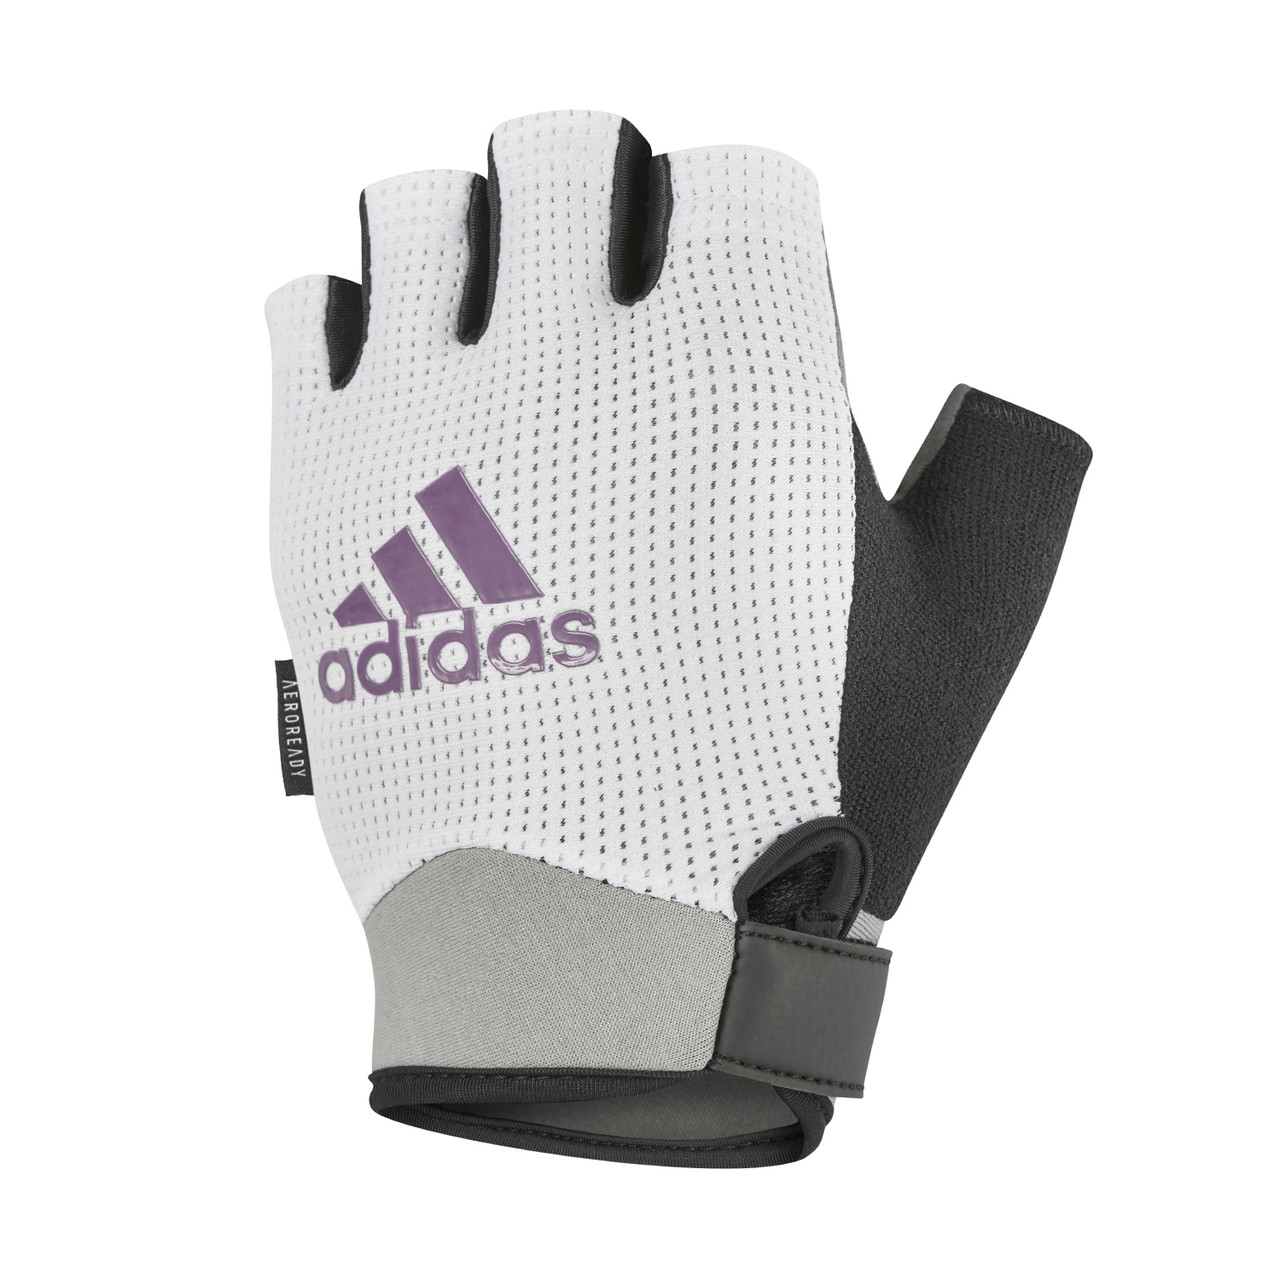 artería base Espíritu  Women's Performance Gloves   adidas Training